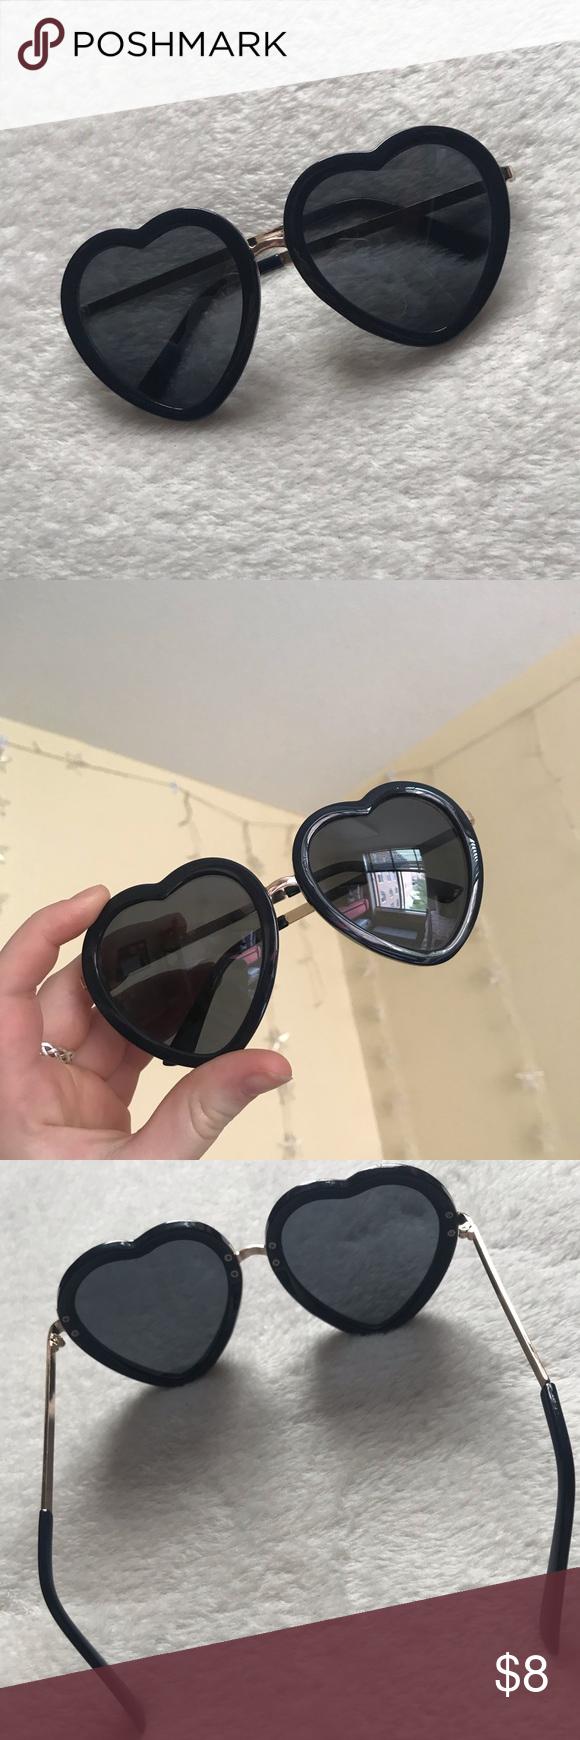 f4afefa67780f PacSun Heart Shaped Sunglasses Big navy blue heart shaped sunglasses from  LA Hearts brand at Pacsun